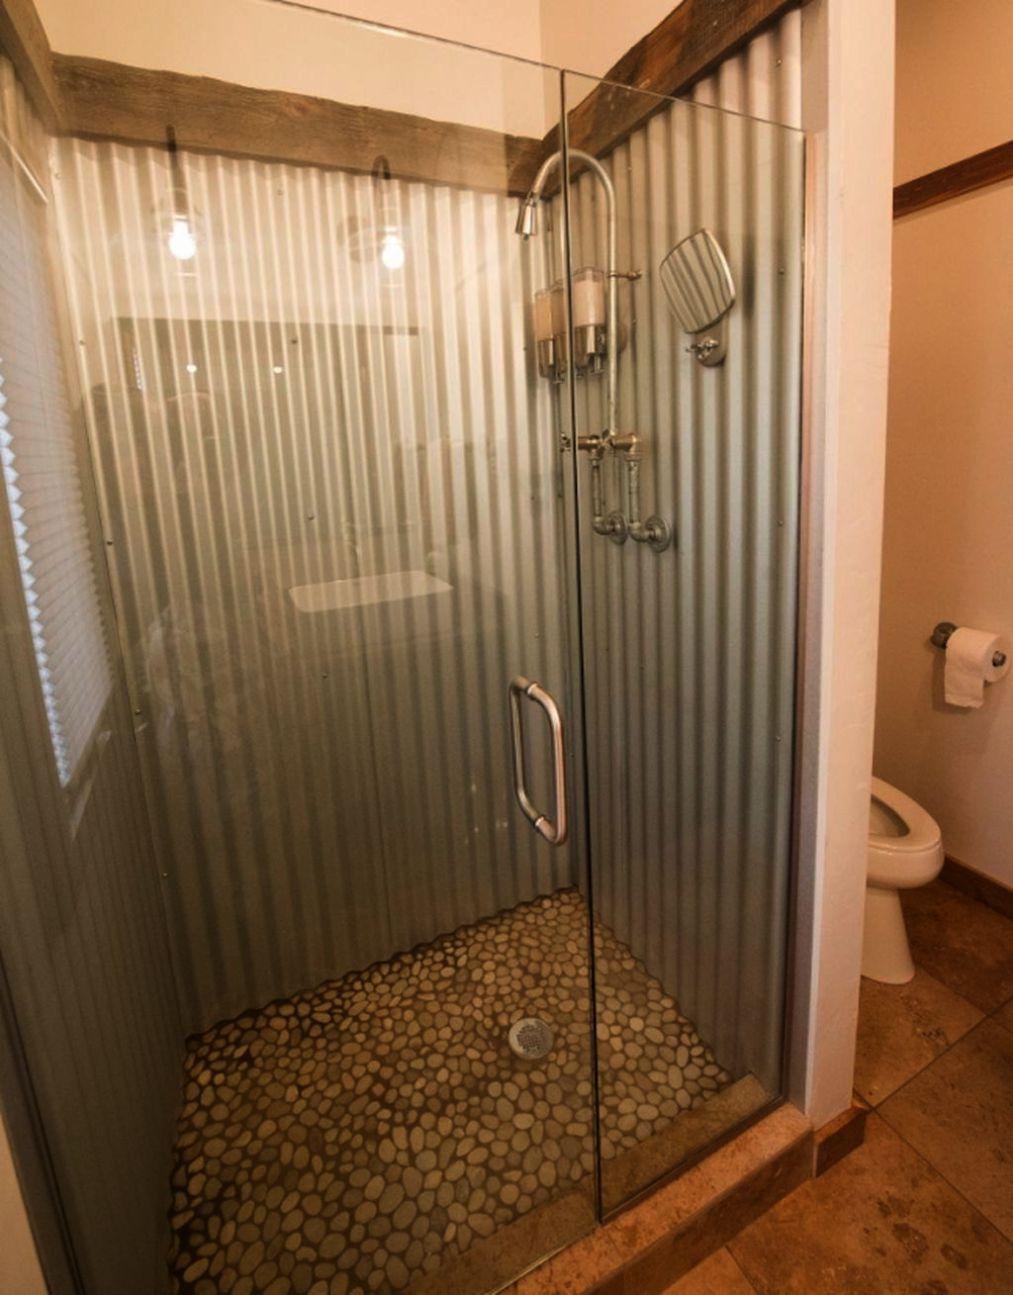 Bathroom Remodel Kit Neither Bathroom Remodel Homewyse Galvanized Shower Galvanized Decor Bathrooms Remodel